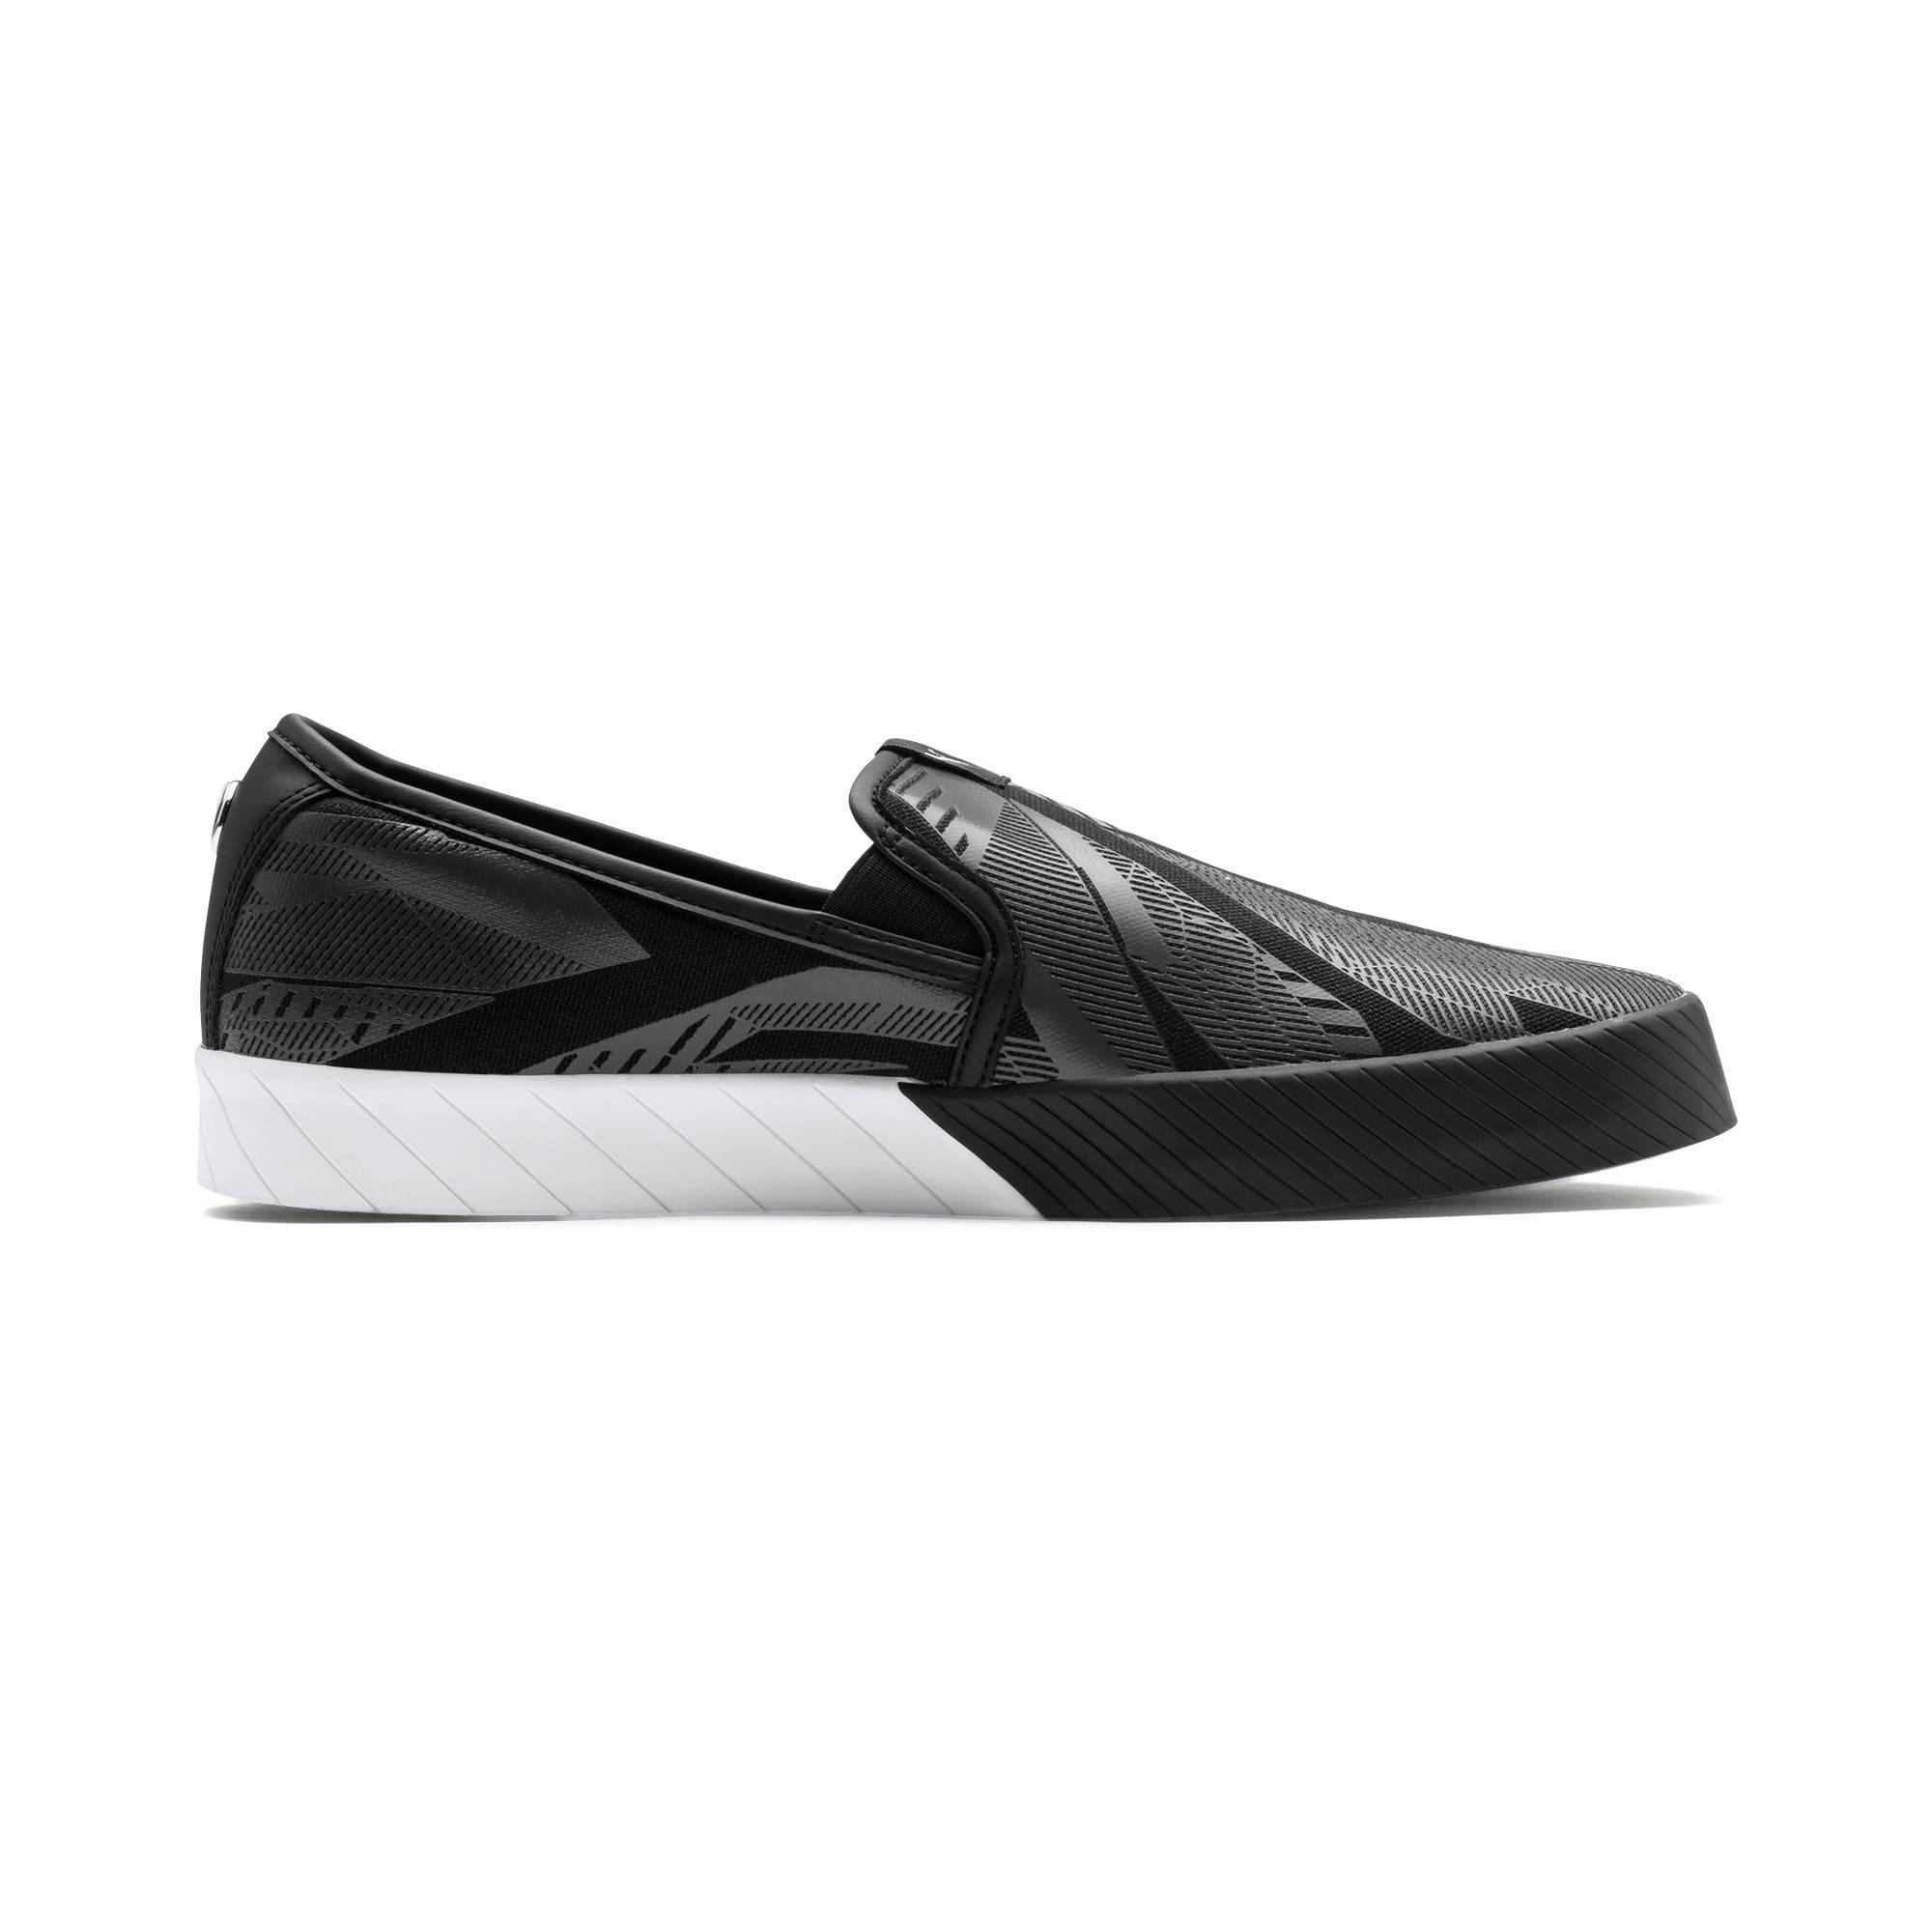 Thumbnail 6 of BMW M Motorsport Slip-On Gradient Track Shoes, Puma Black-Puma Black, medium